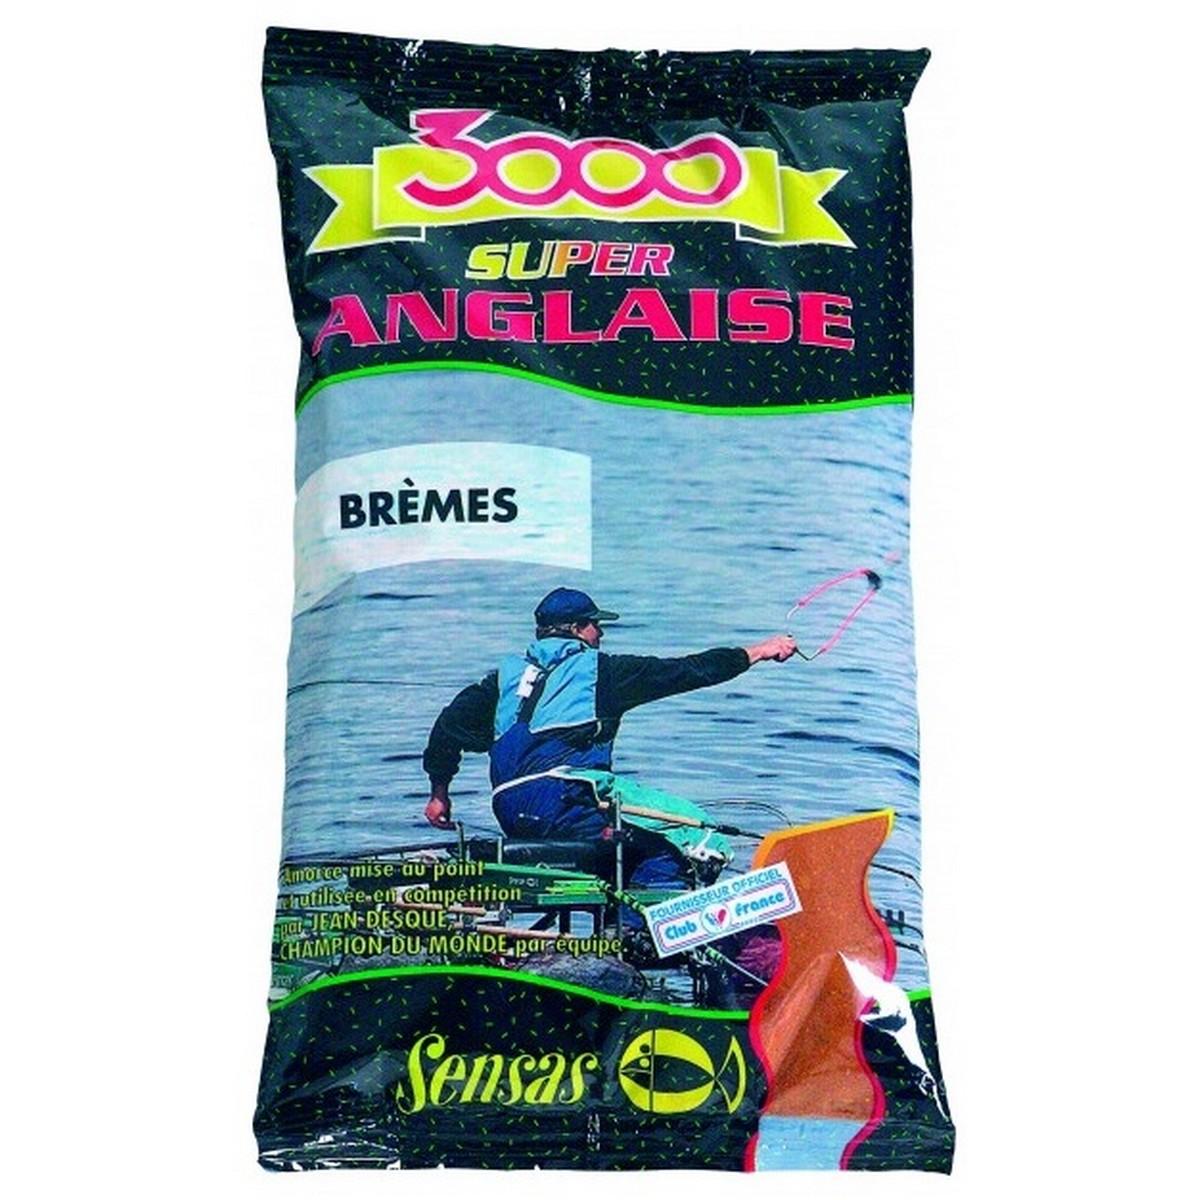 Захранка за риболов Sensas 3000 Super Anglaise Bremes